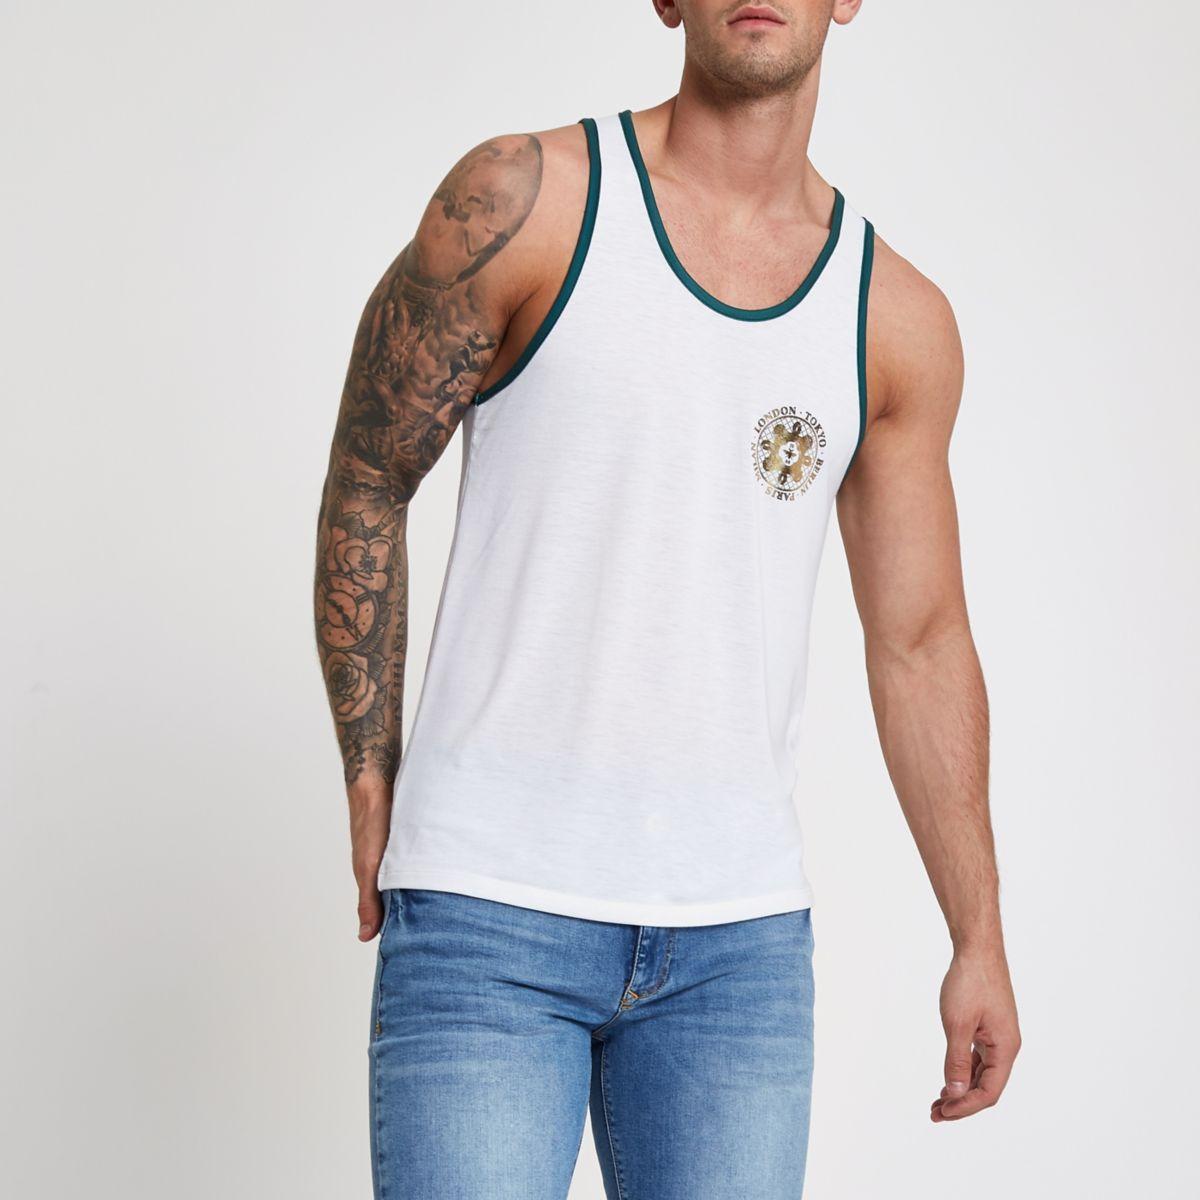 White slim fit back print vest top